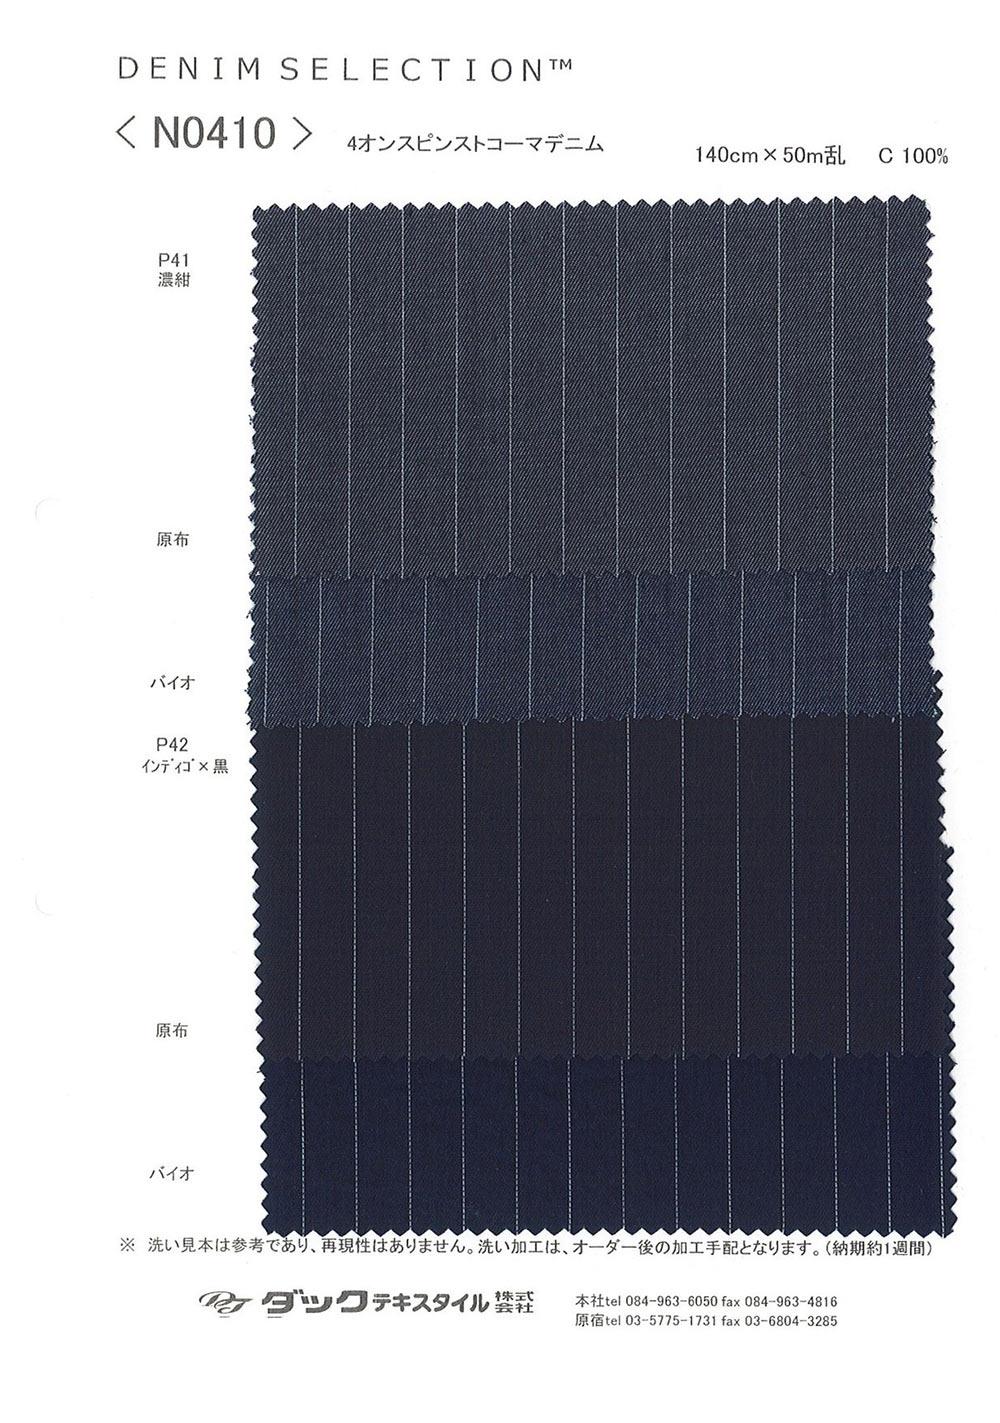 N0410-P 4オンスピンストコーマデニム[生地] ダックテキスタイル/オークラ商事 - ApparelX アパレル資材卸通販